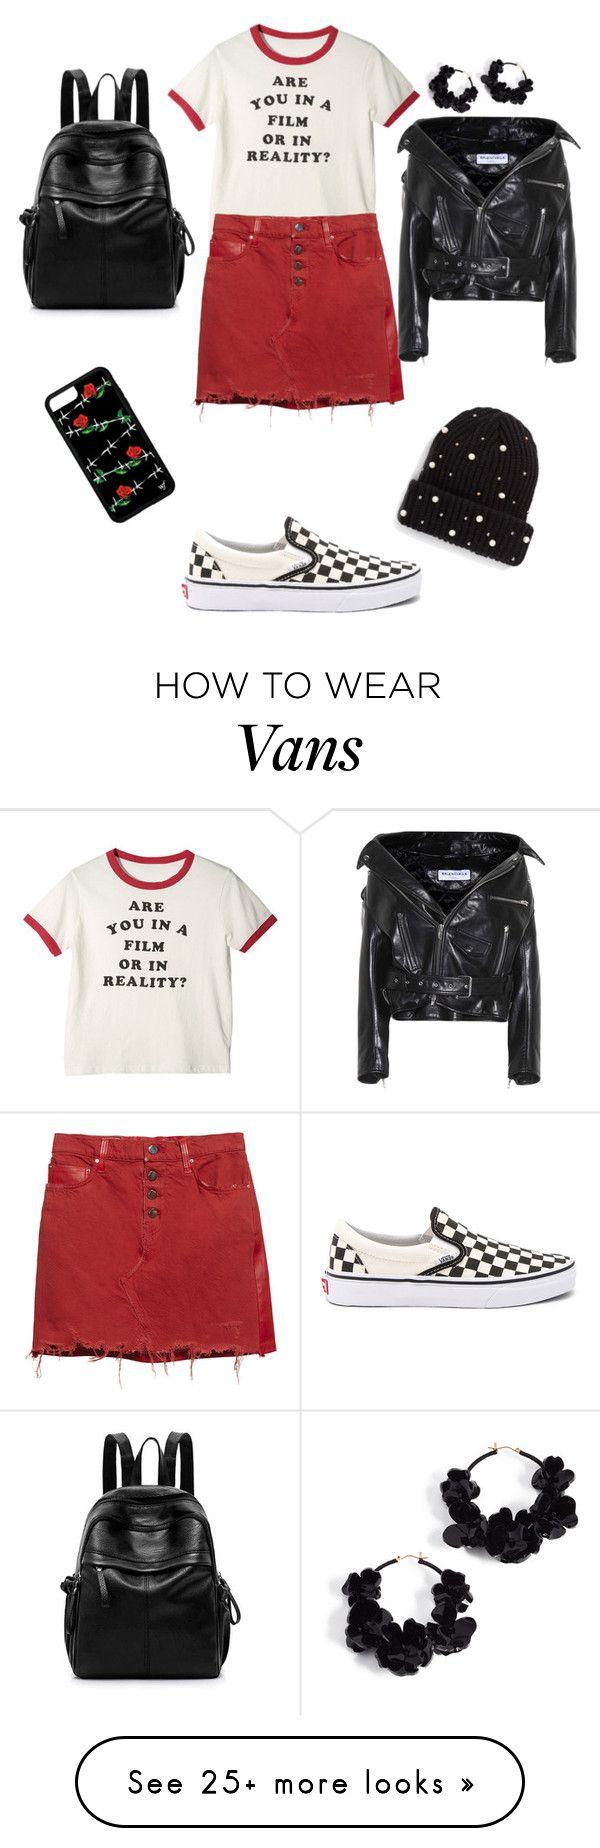 """t-shirt dress up"" by fashiondesignergirl25 on Polyvore featuring AMIRI, Vans, BP., Oscar de la Renta, Balenciaga and MyFaveTshirt"